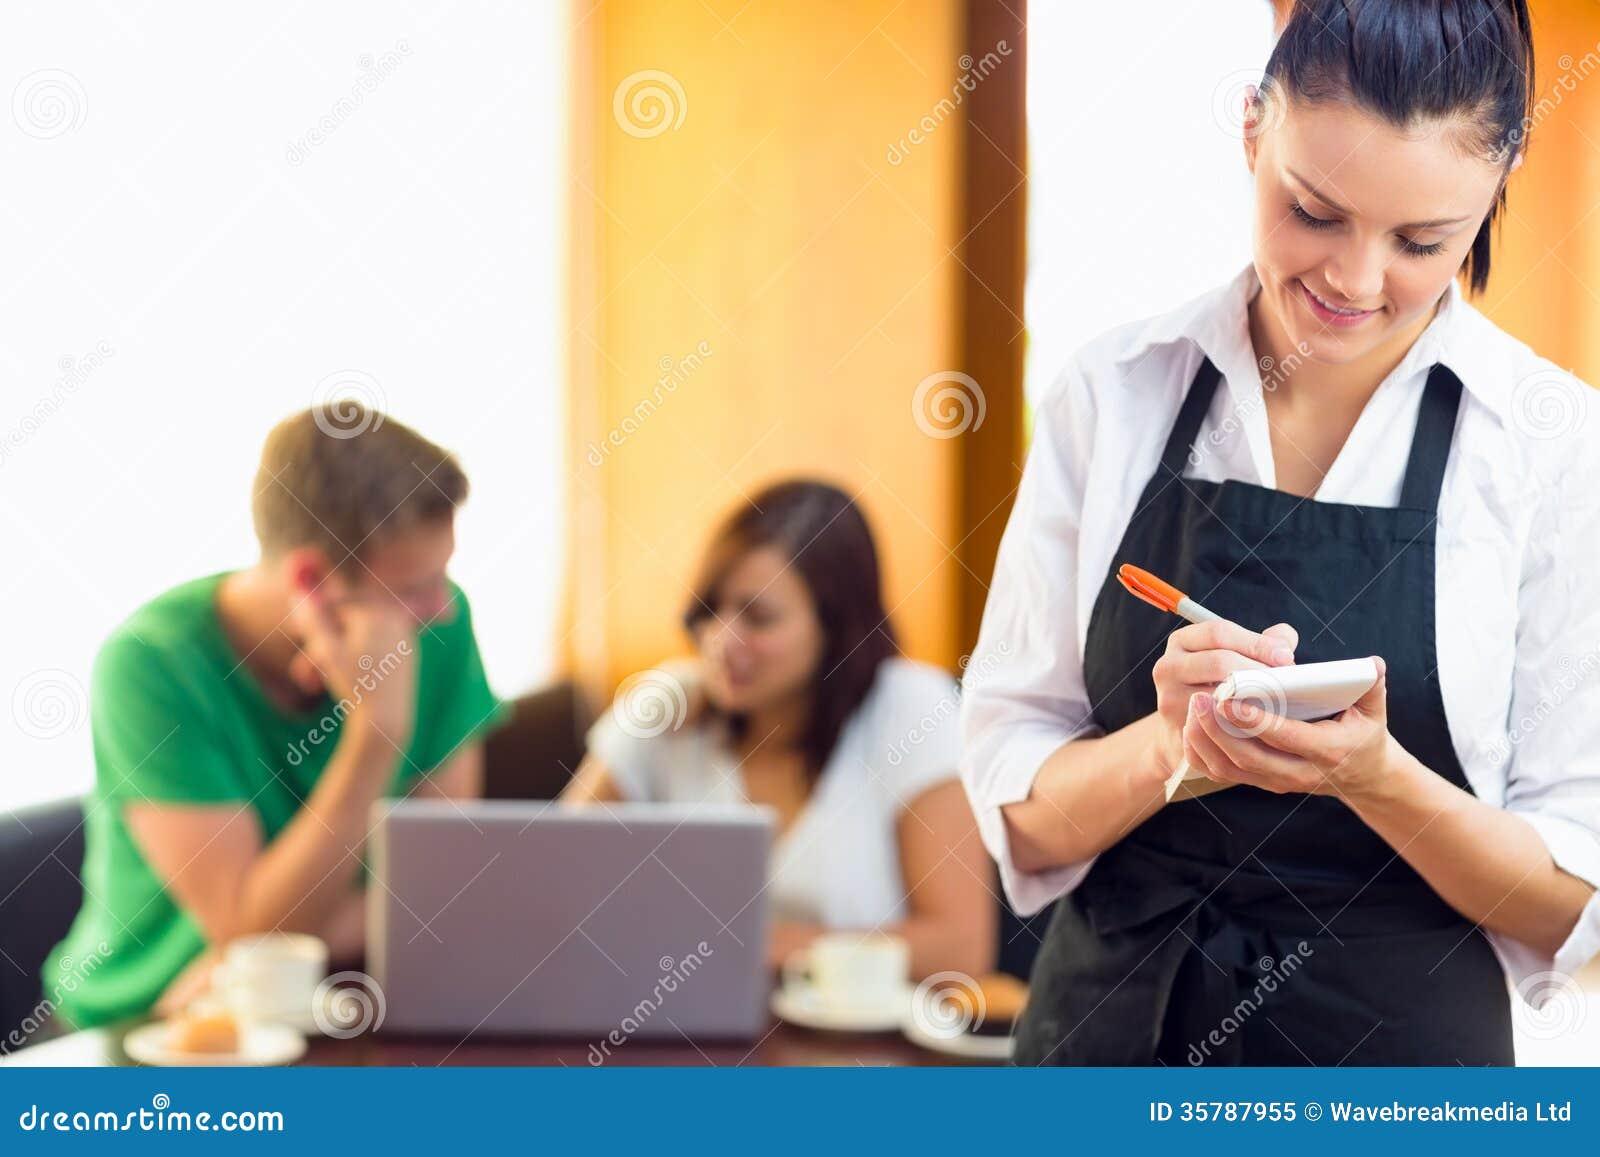 short essay on use of laptop